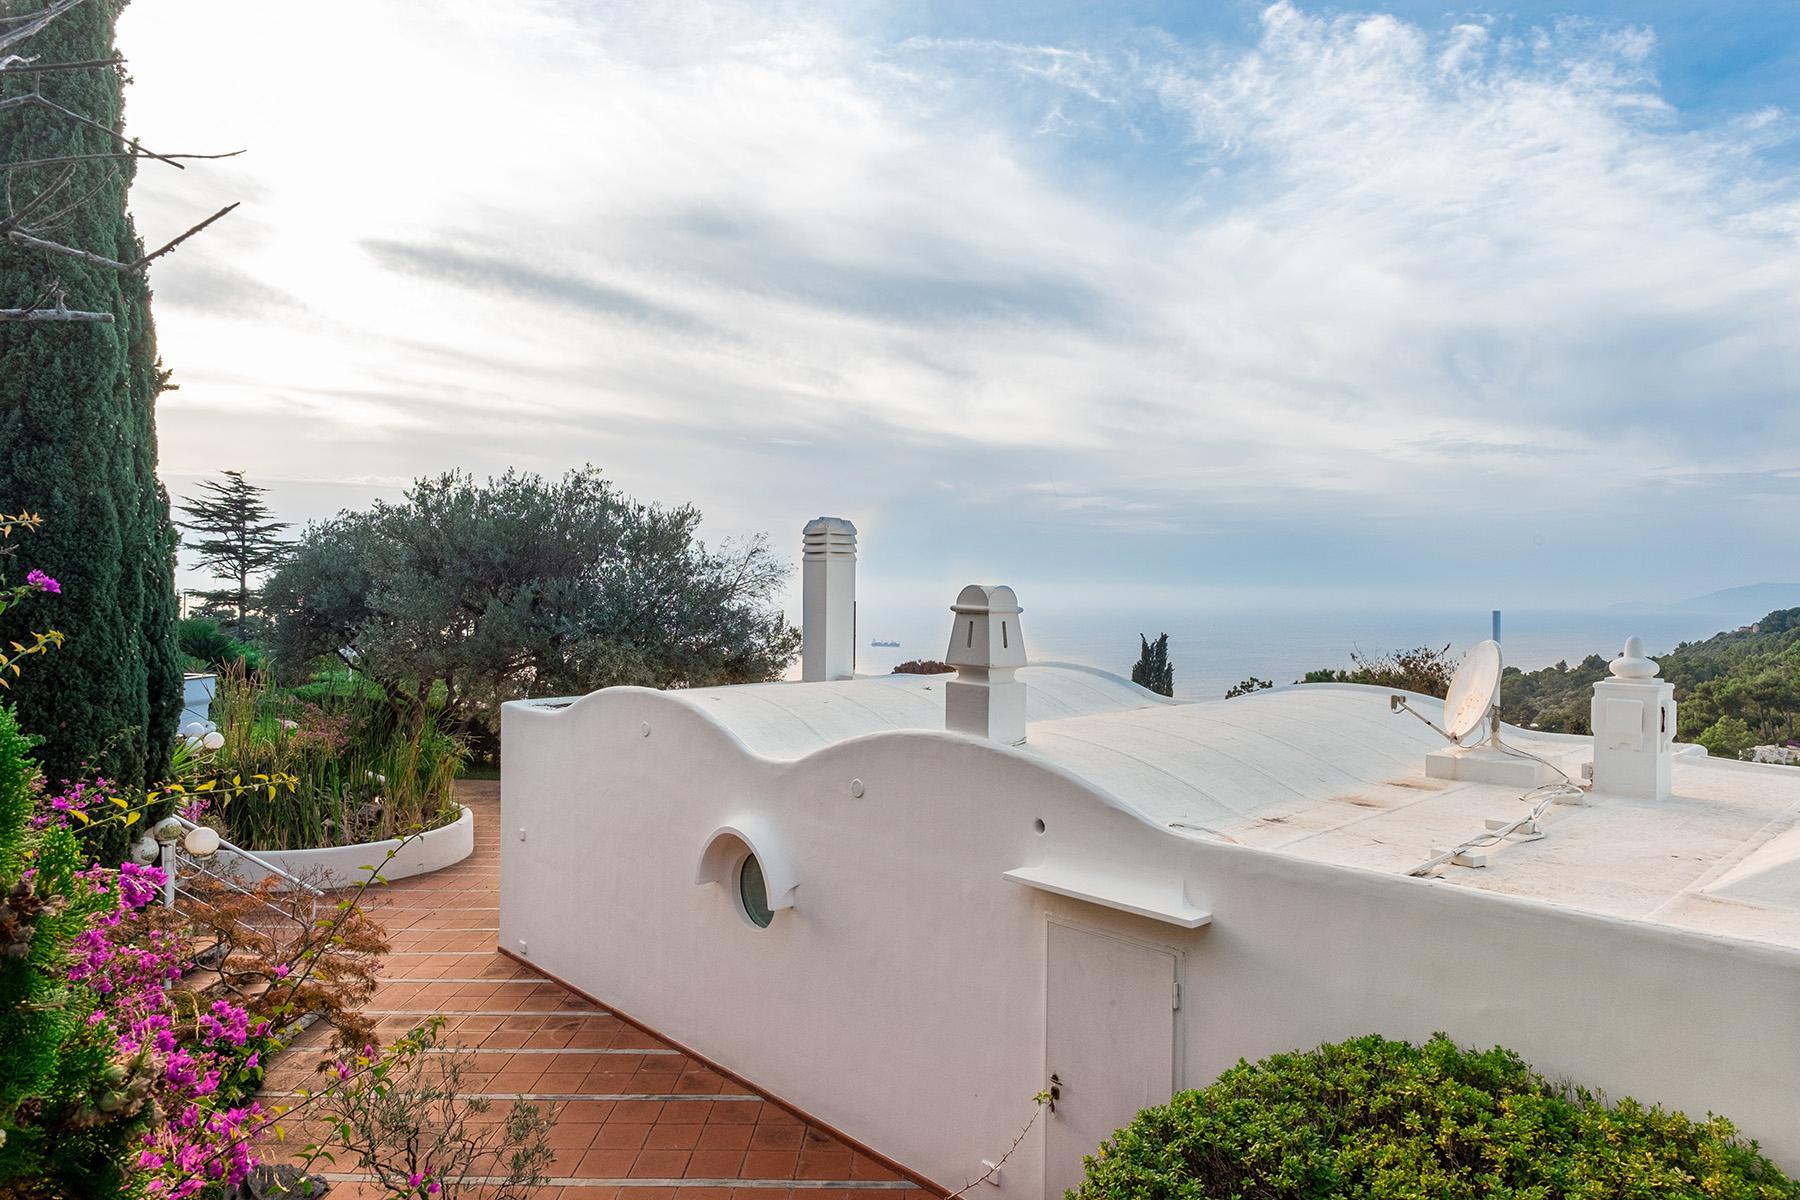 Panoramic villa with swimming pool in Anacapri city center - 2